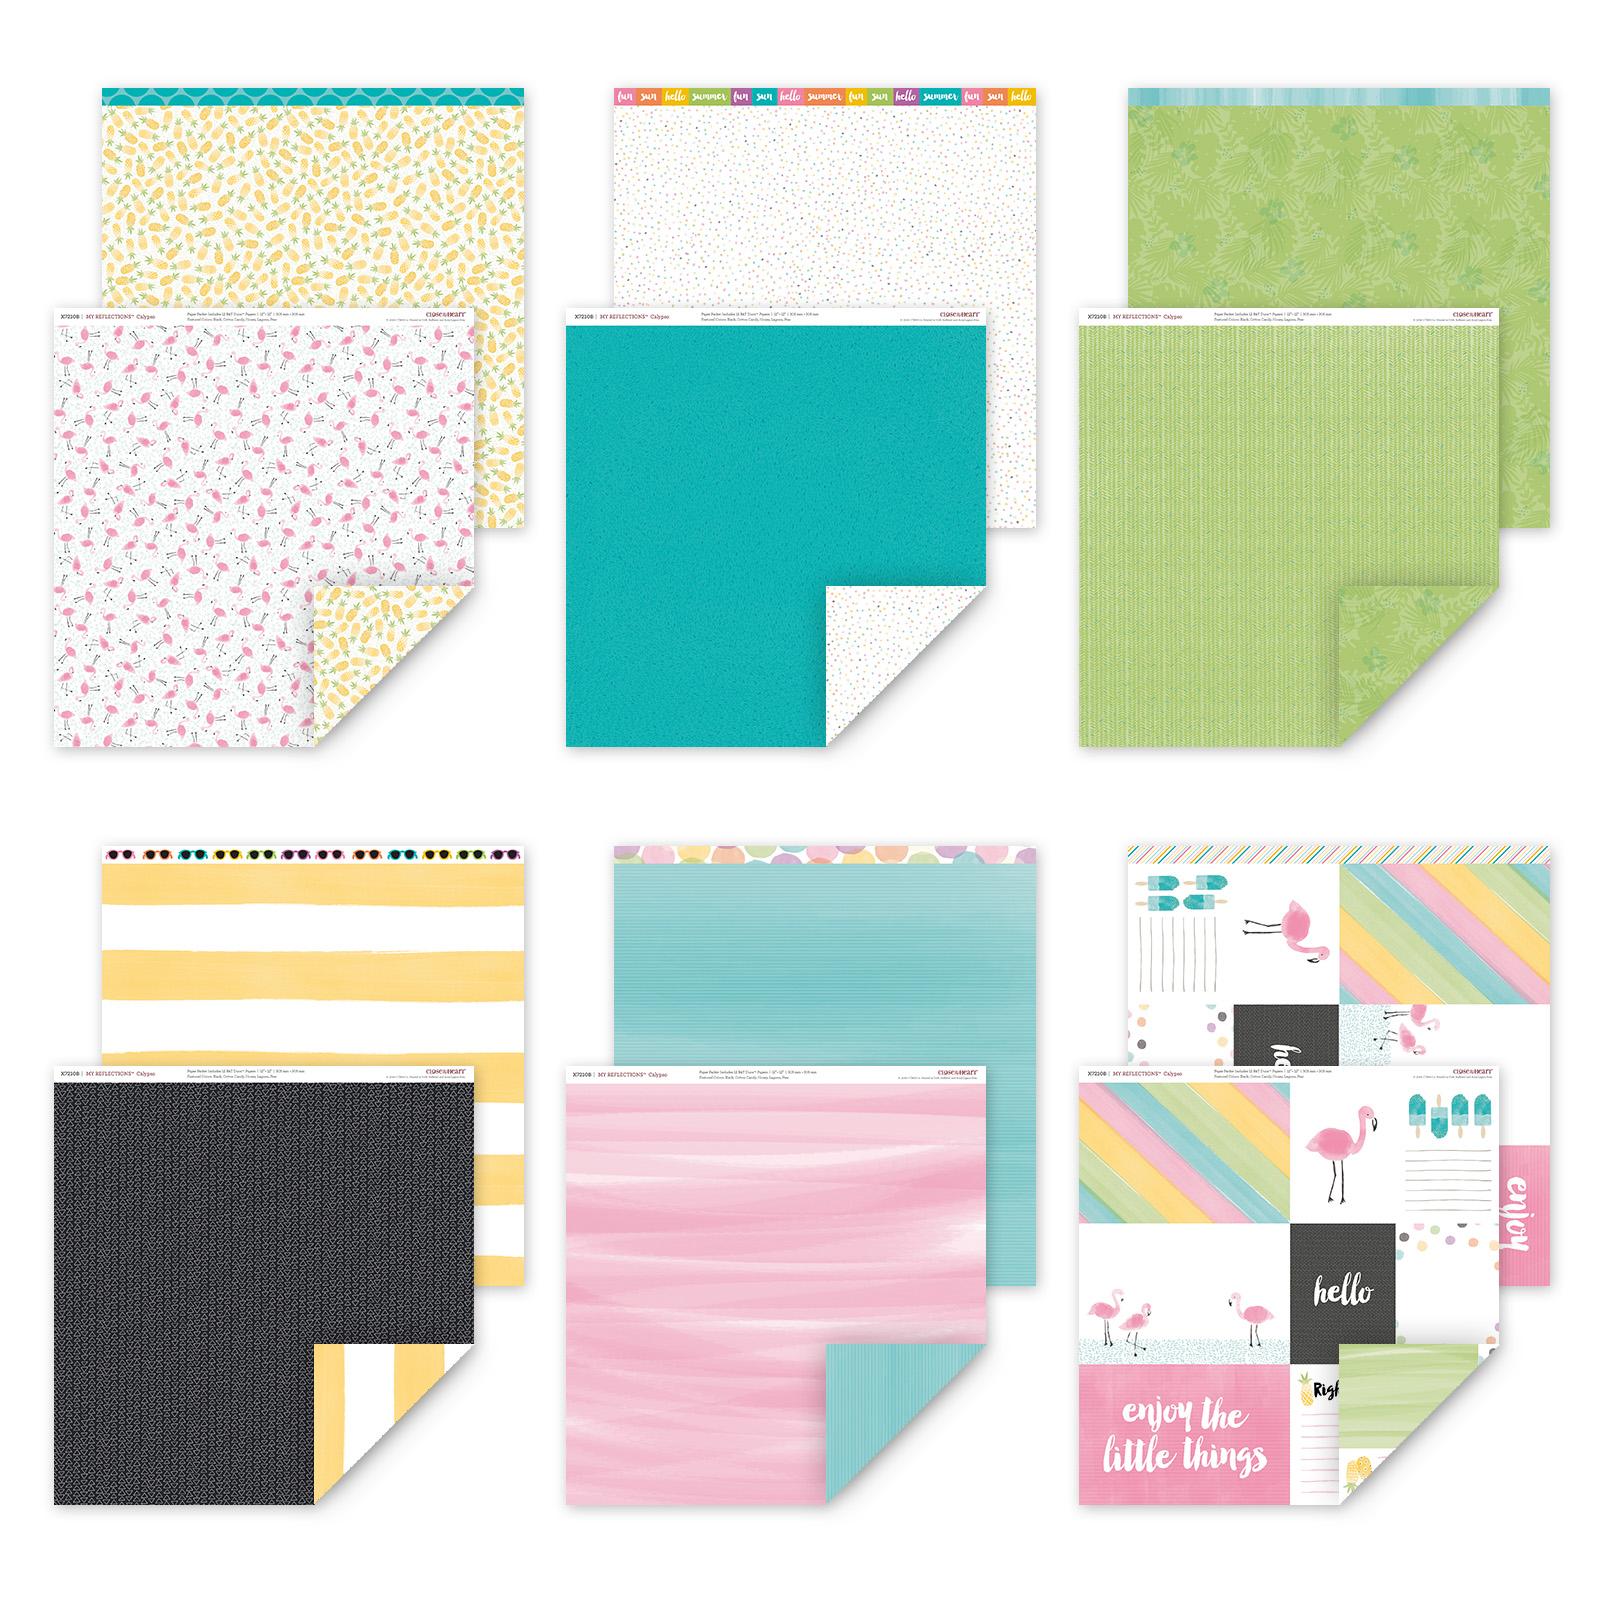 Calypso Paper Packet